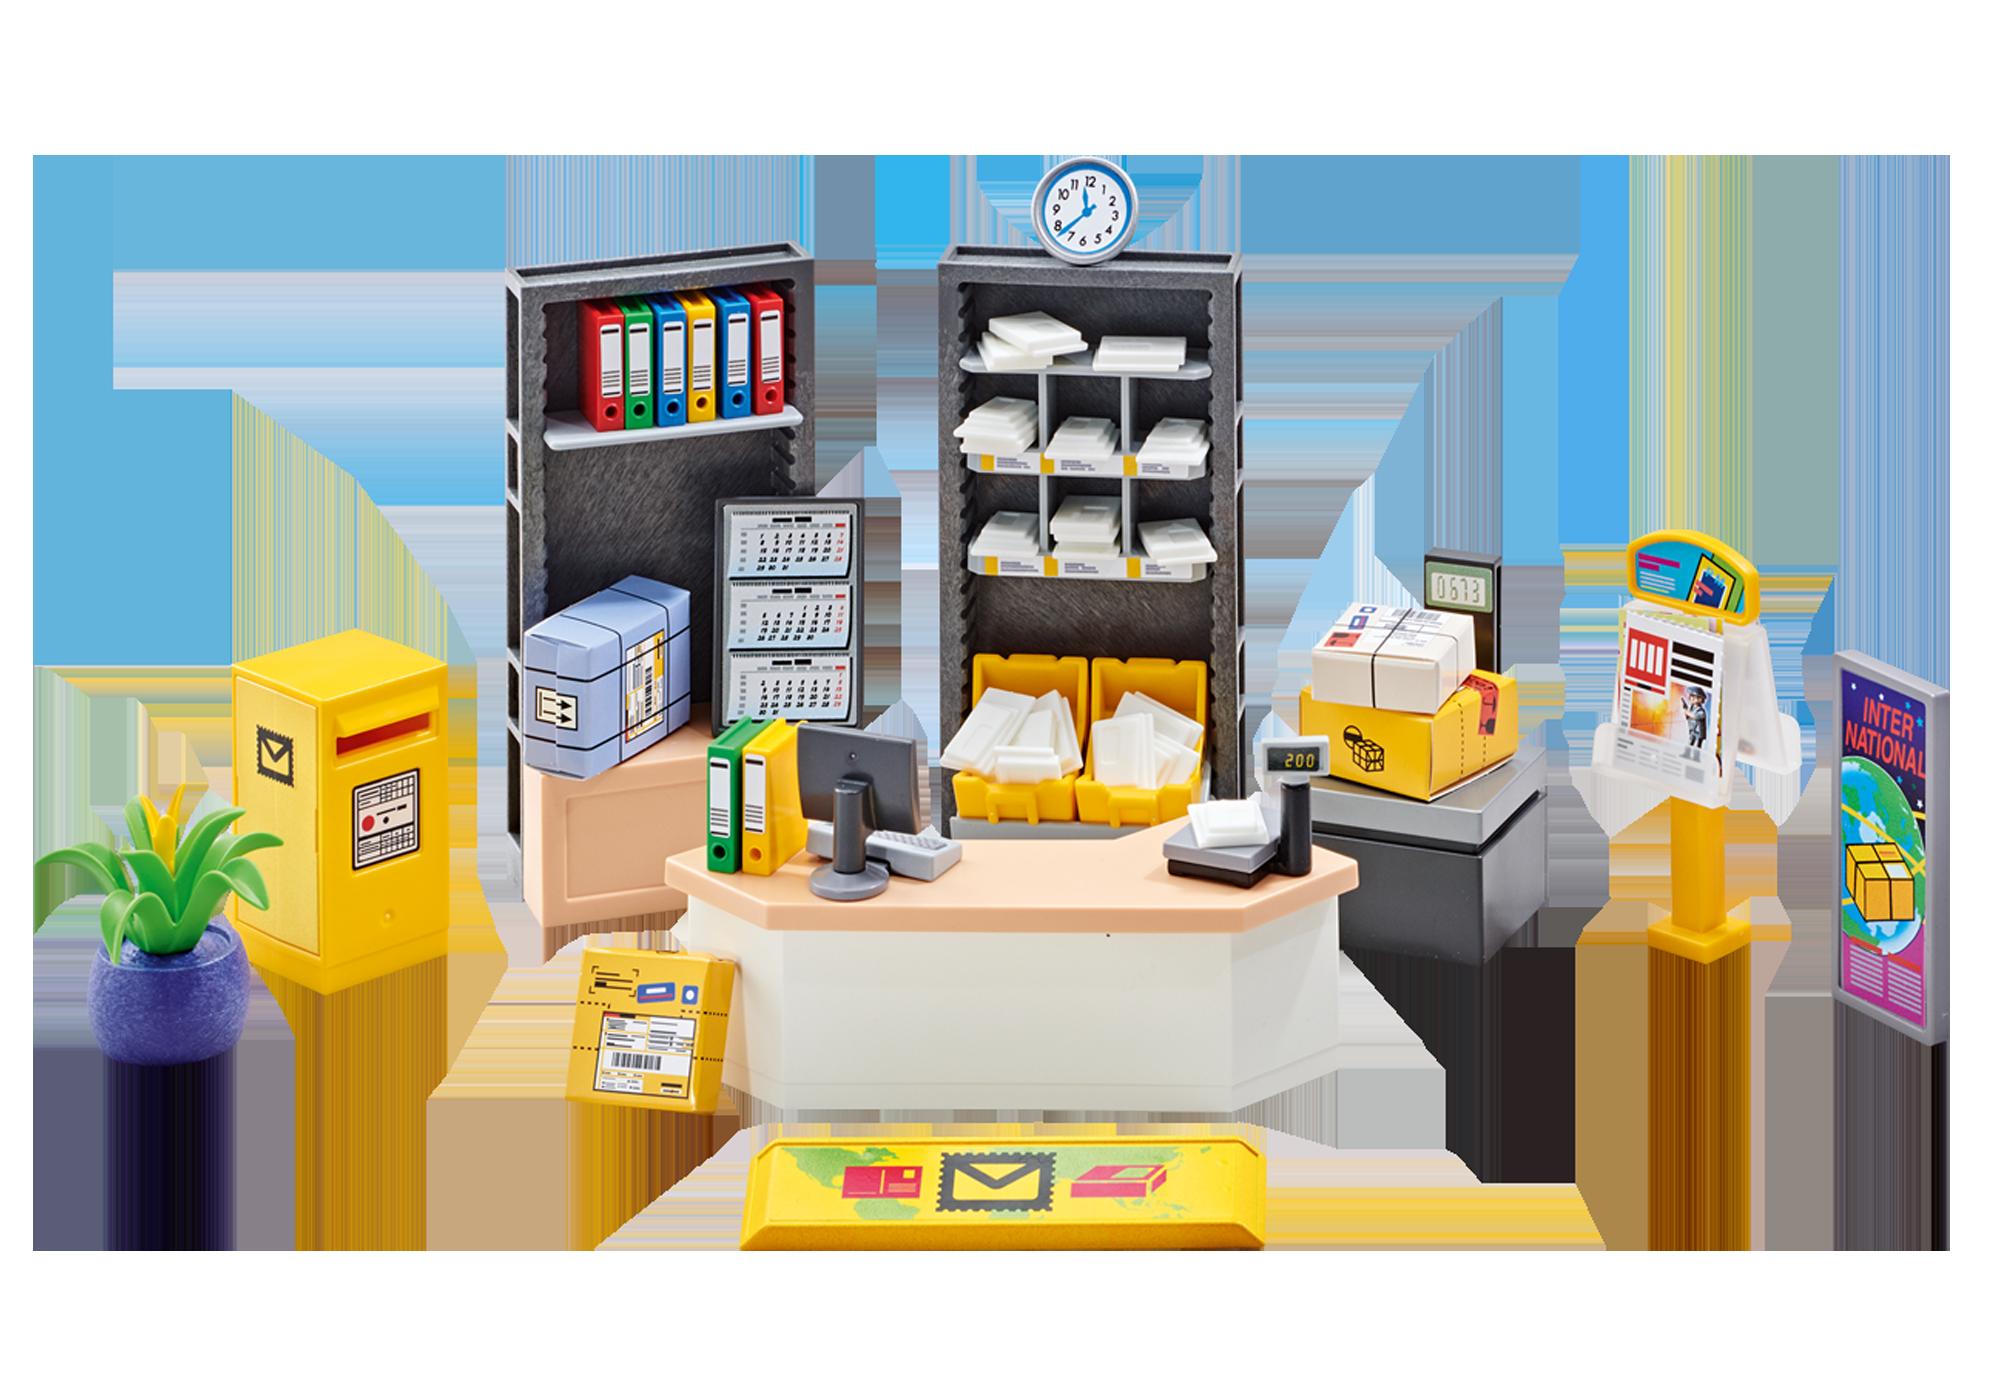 http://media.playmobil.com/i/playmobil/9807_product_detail/Aménagement pour bureau de poste